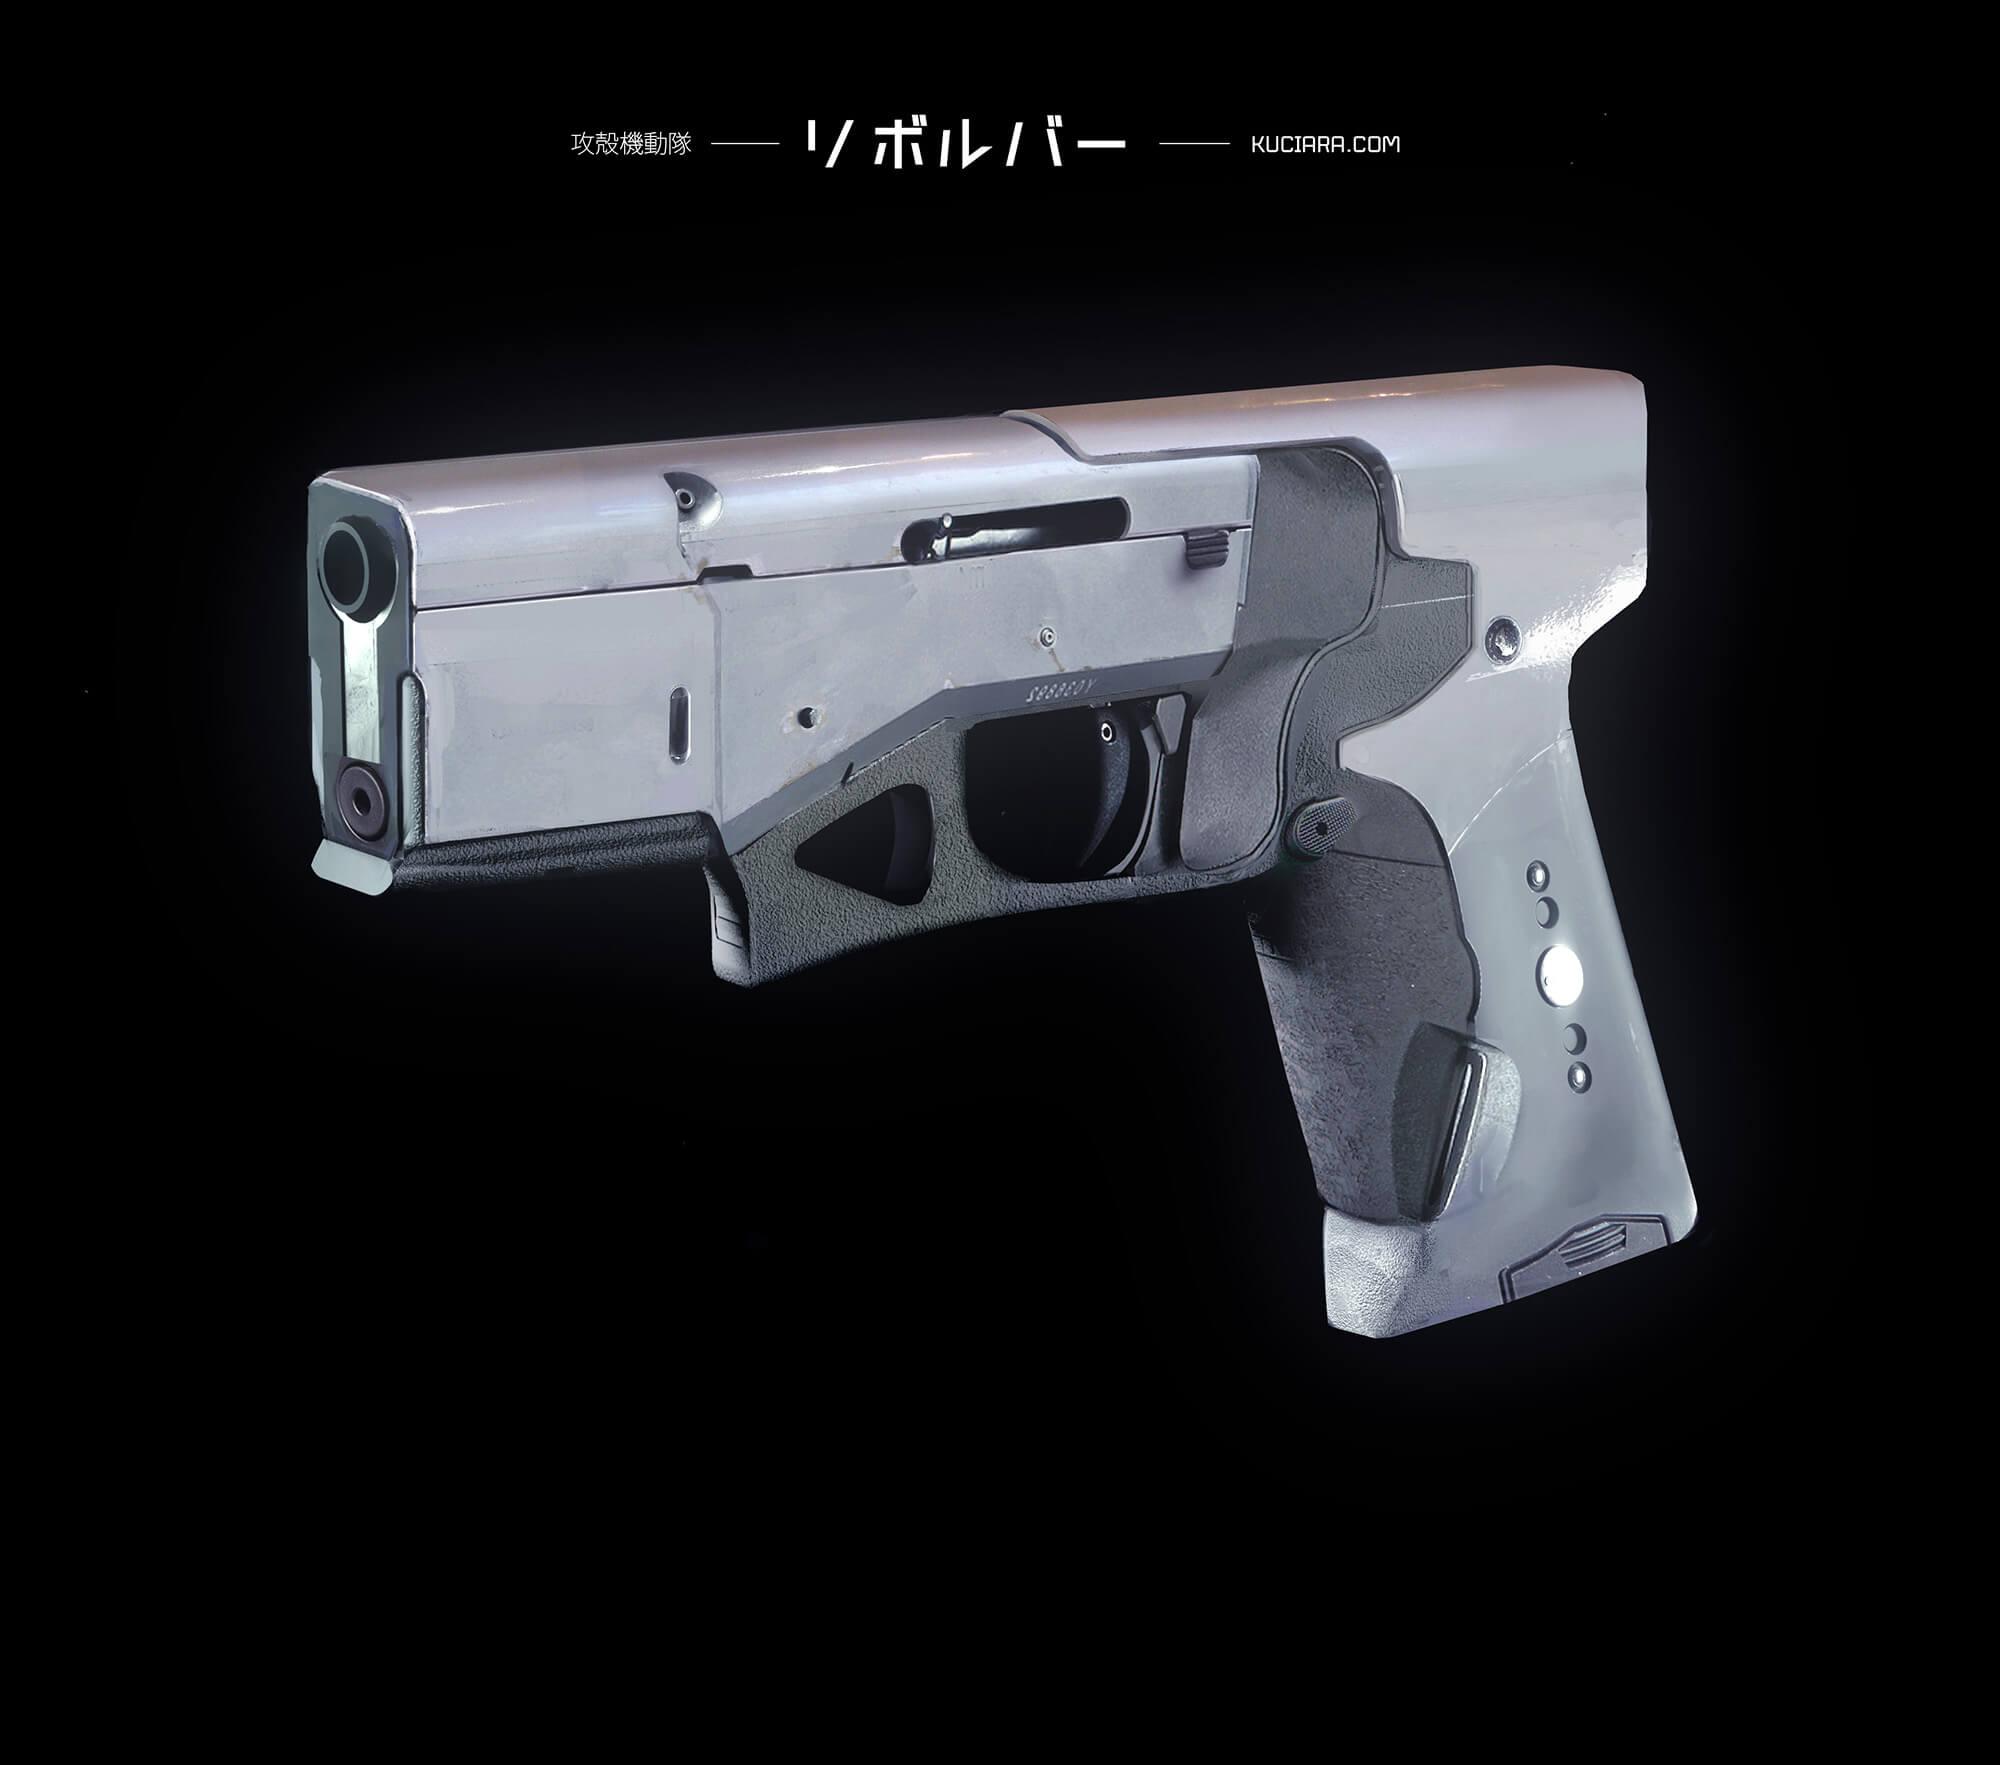 092115_WPN_Major_Pistol_MK_v001C